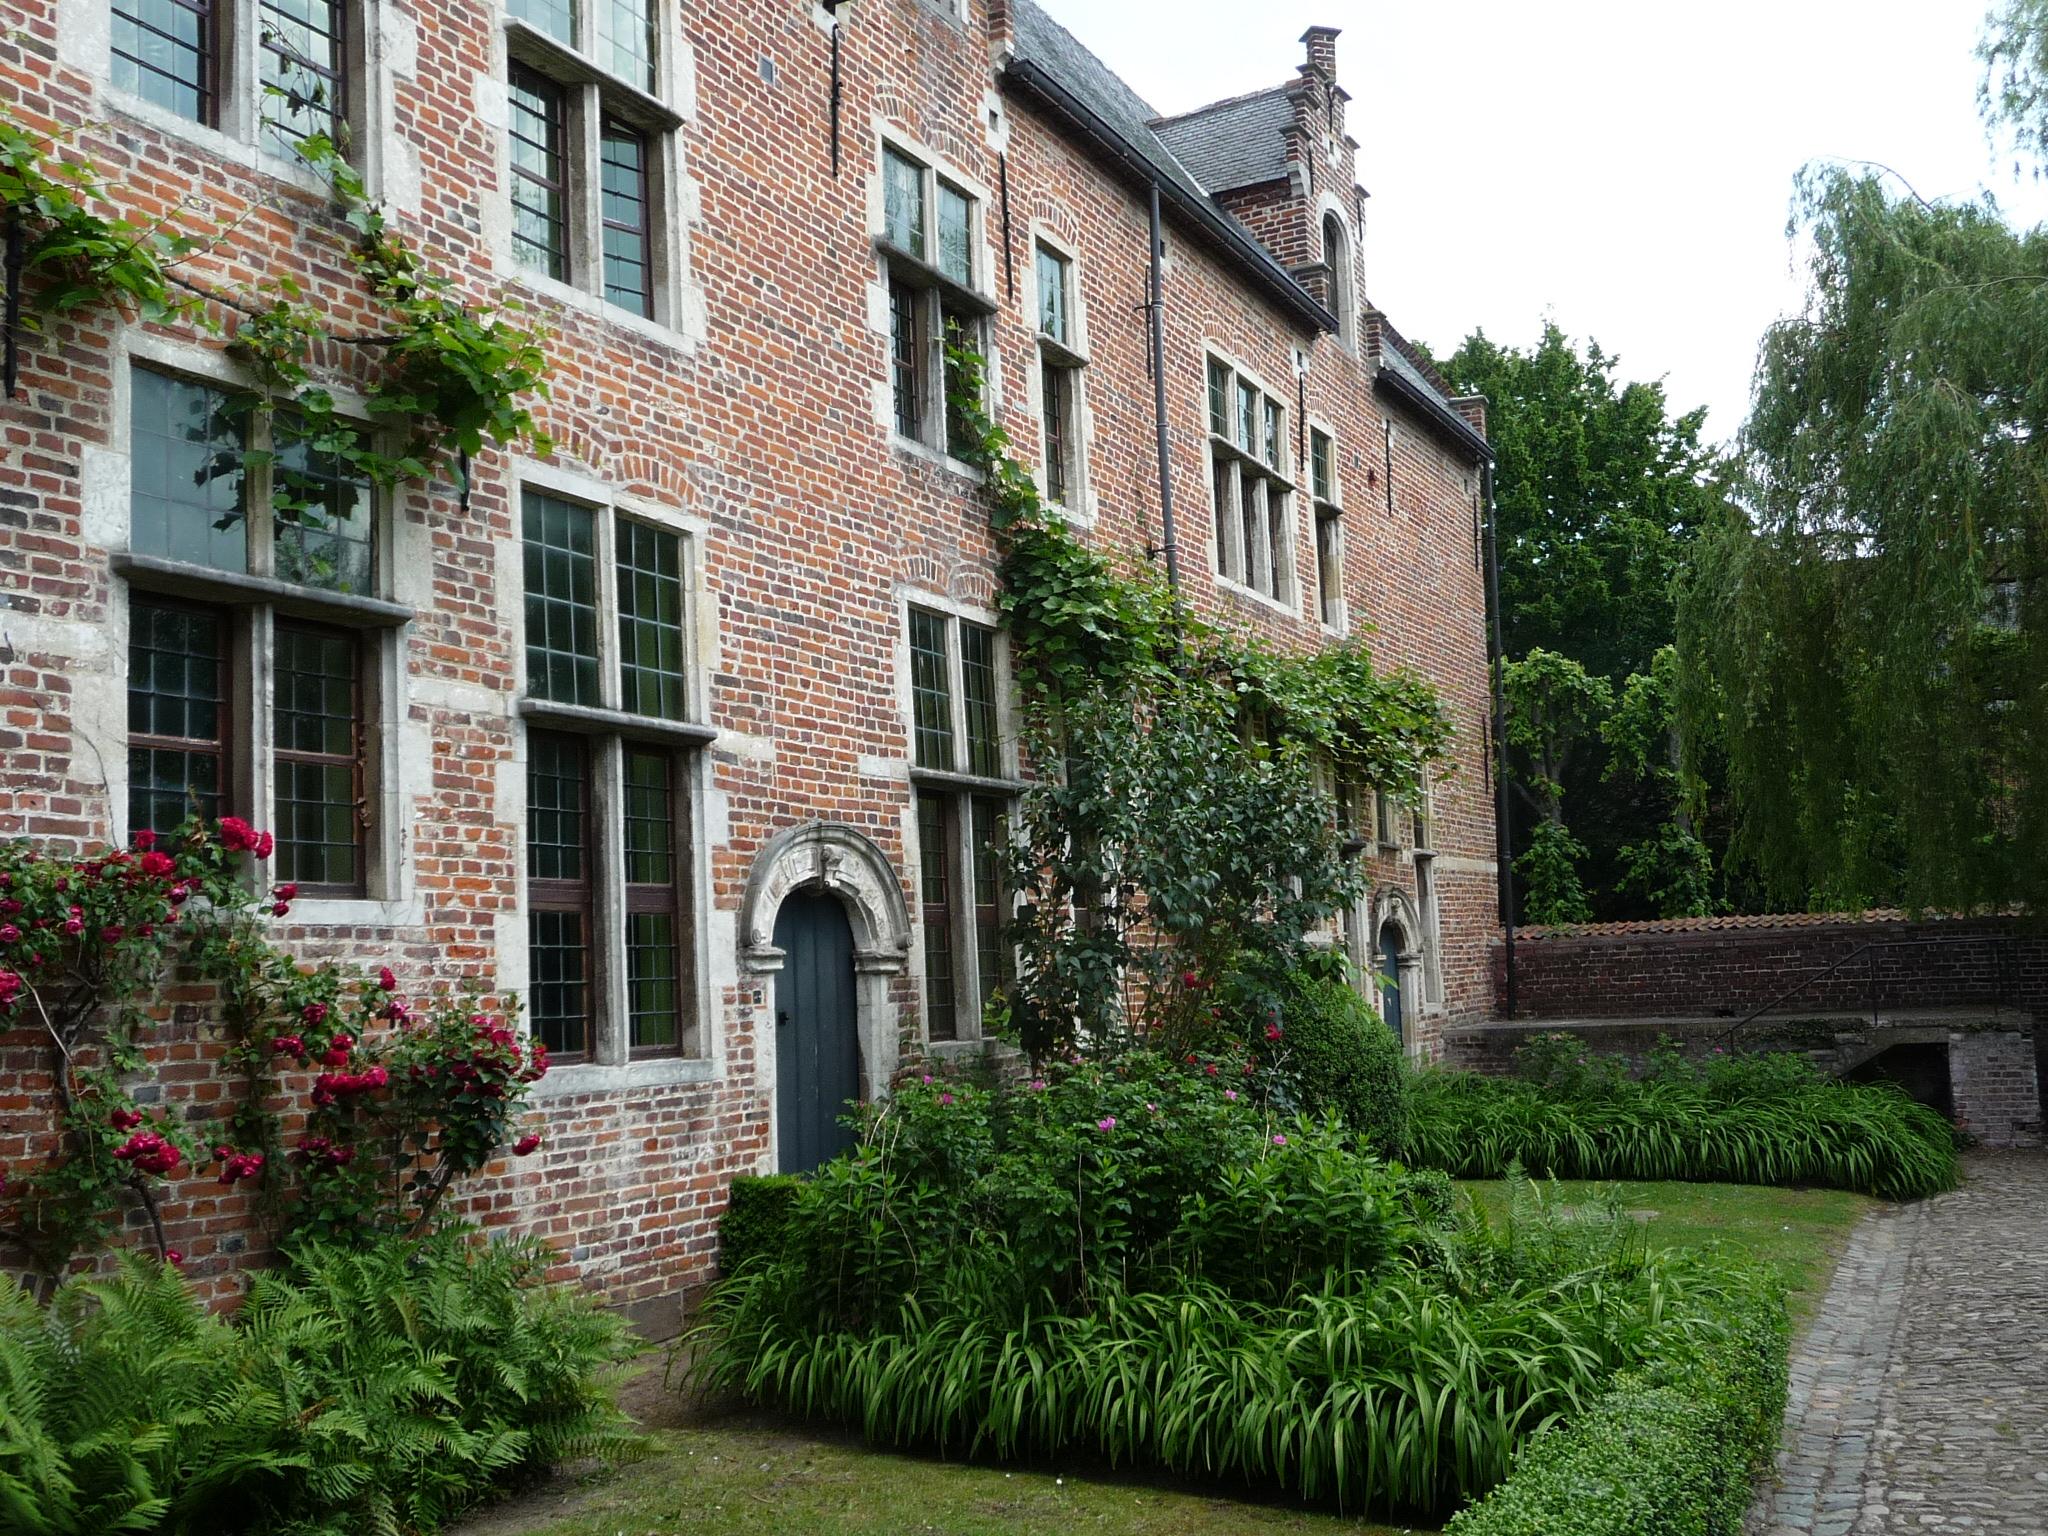 visit the Groot Begijnhof in Leuven